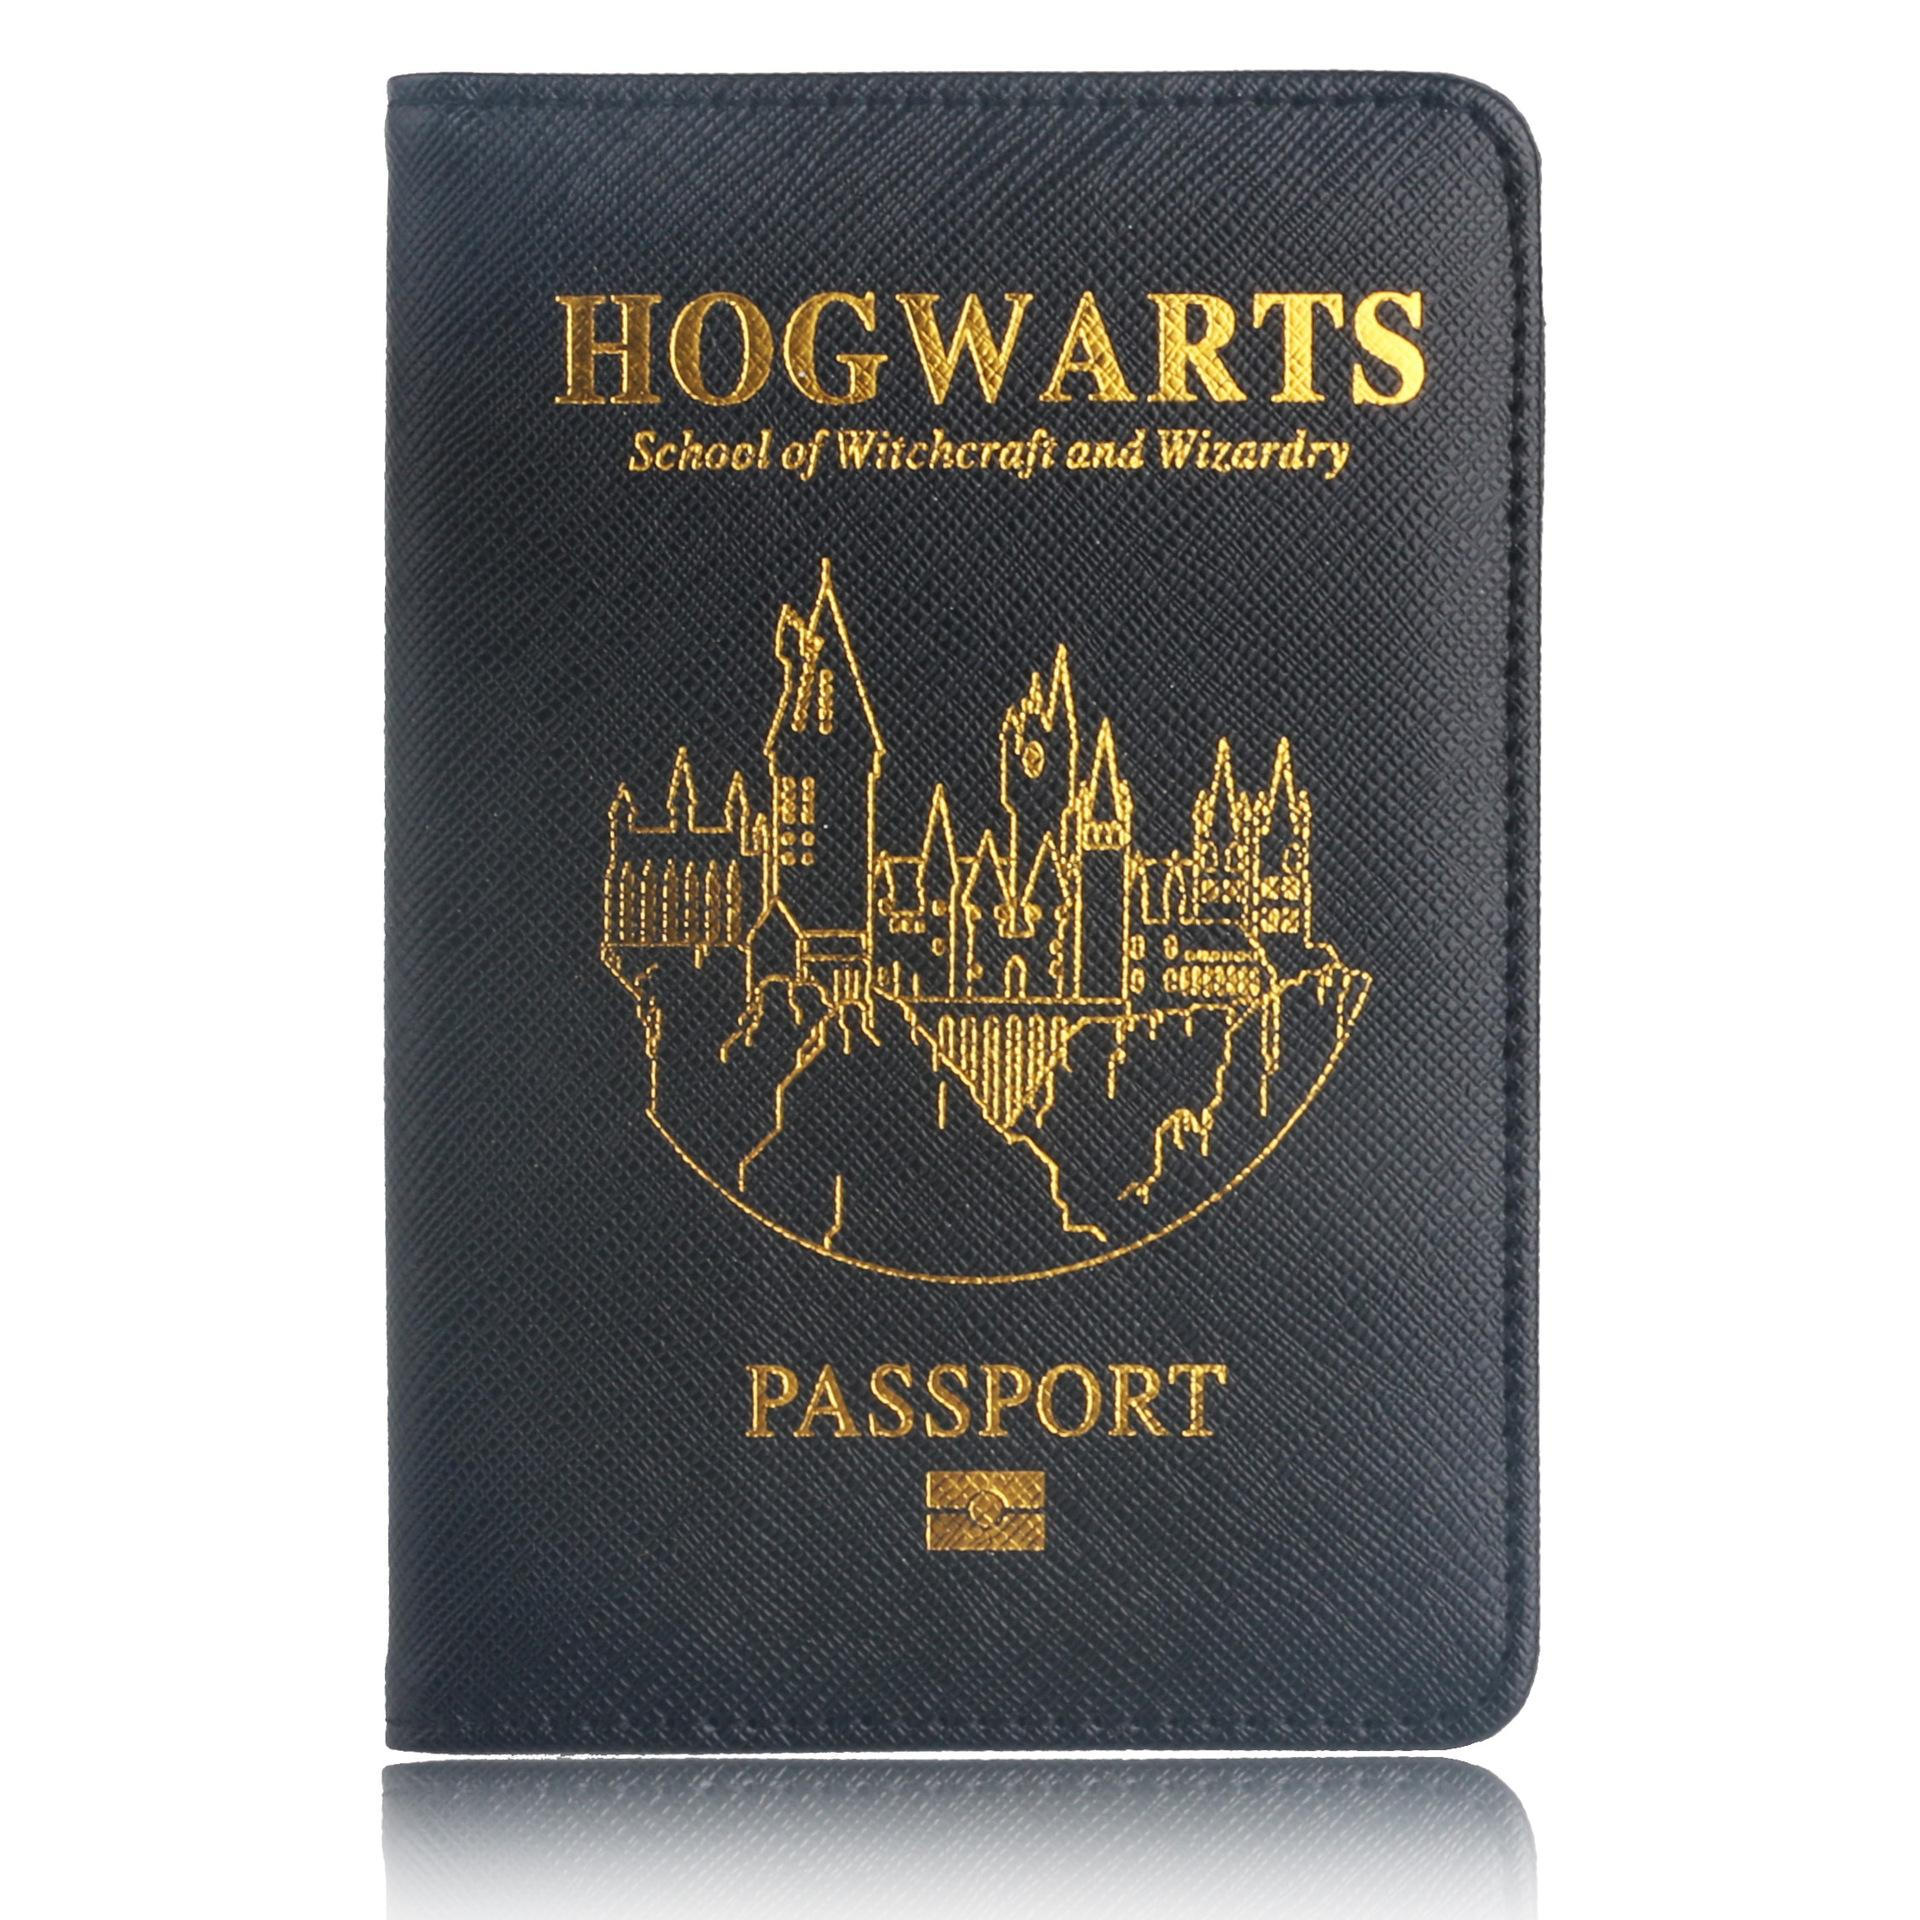 cb0a48515b5 Multifunctional Rfid Blocking Harry Potter Passport Cover Leather Hogwarts  Gryffindor Ravenclaw Passport Holder Case